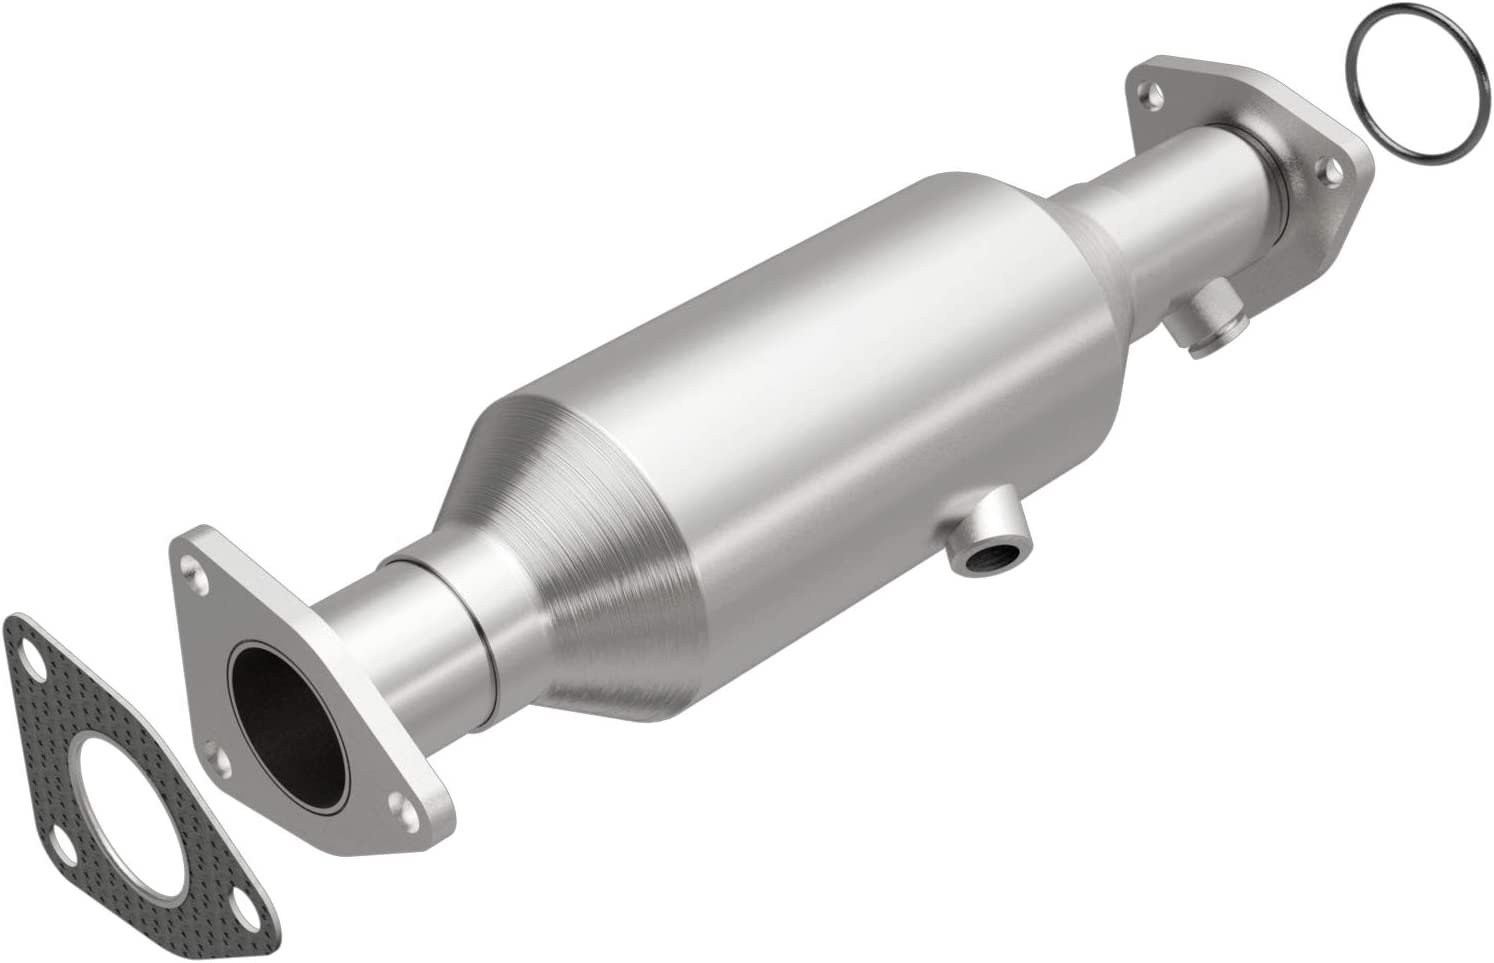 Non CARB compliant MagnaFlow 49478 Direct Fit Catalytic Converter